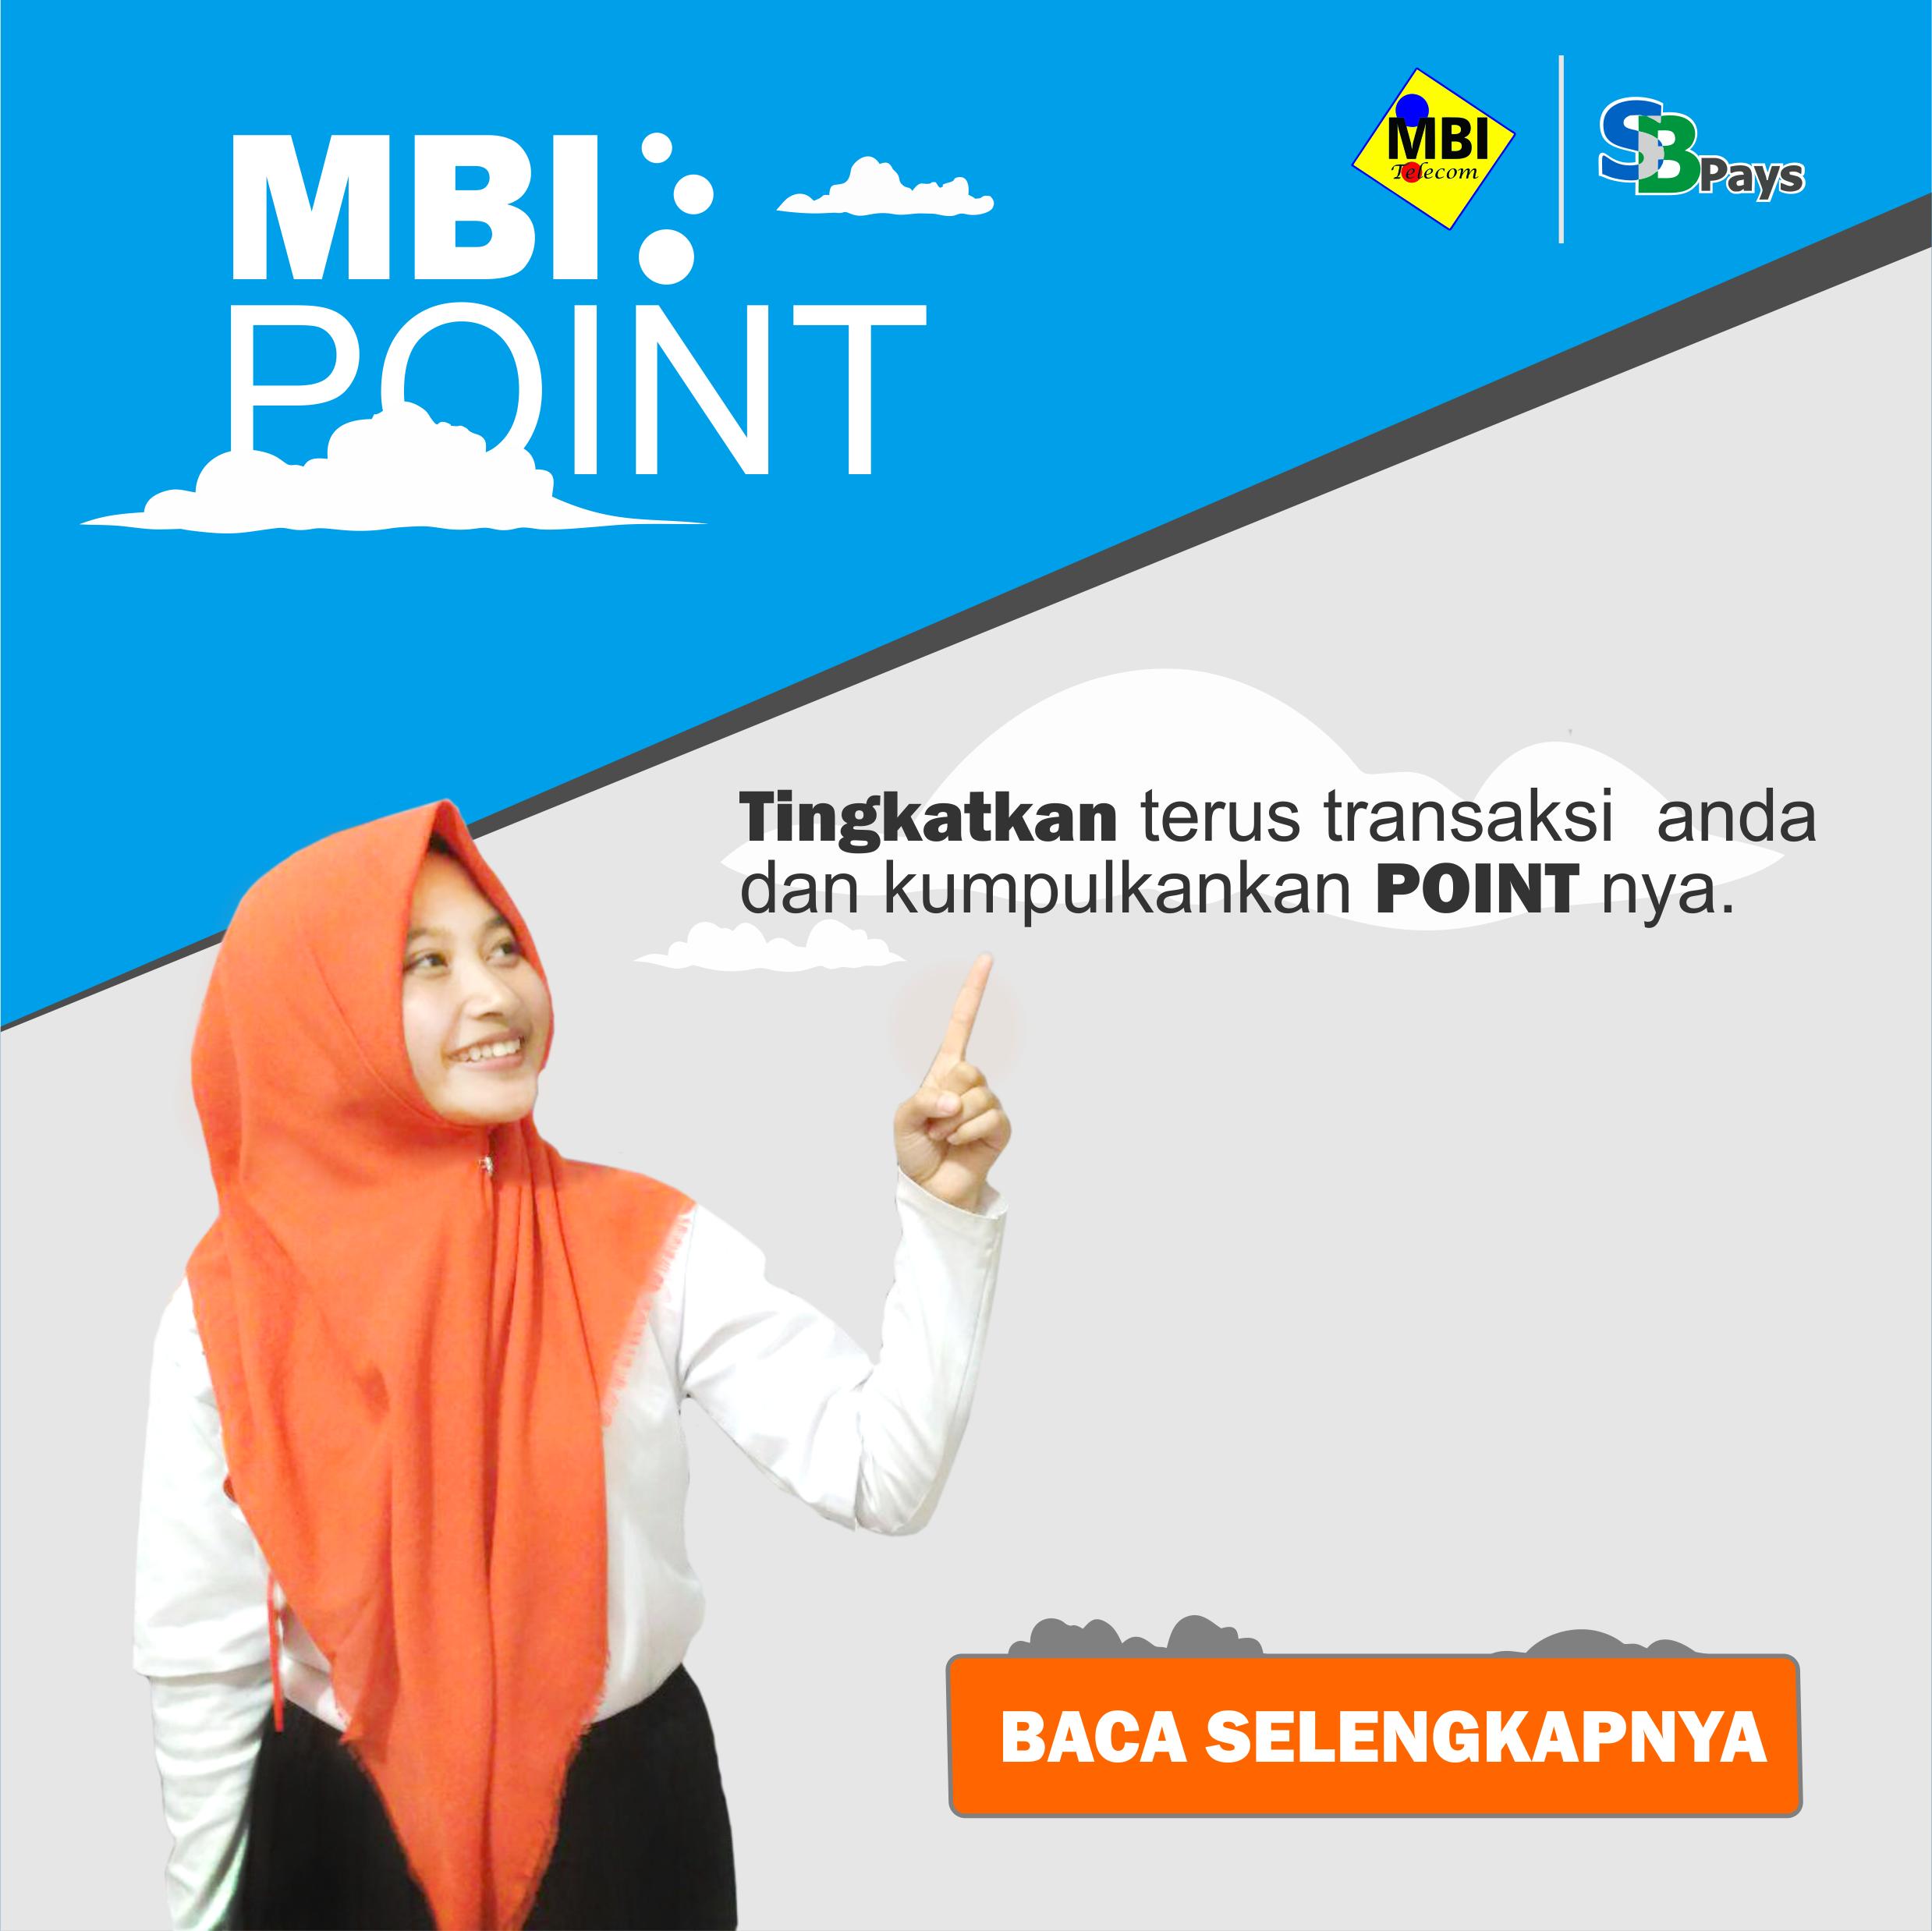 MBI Point